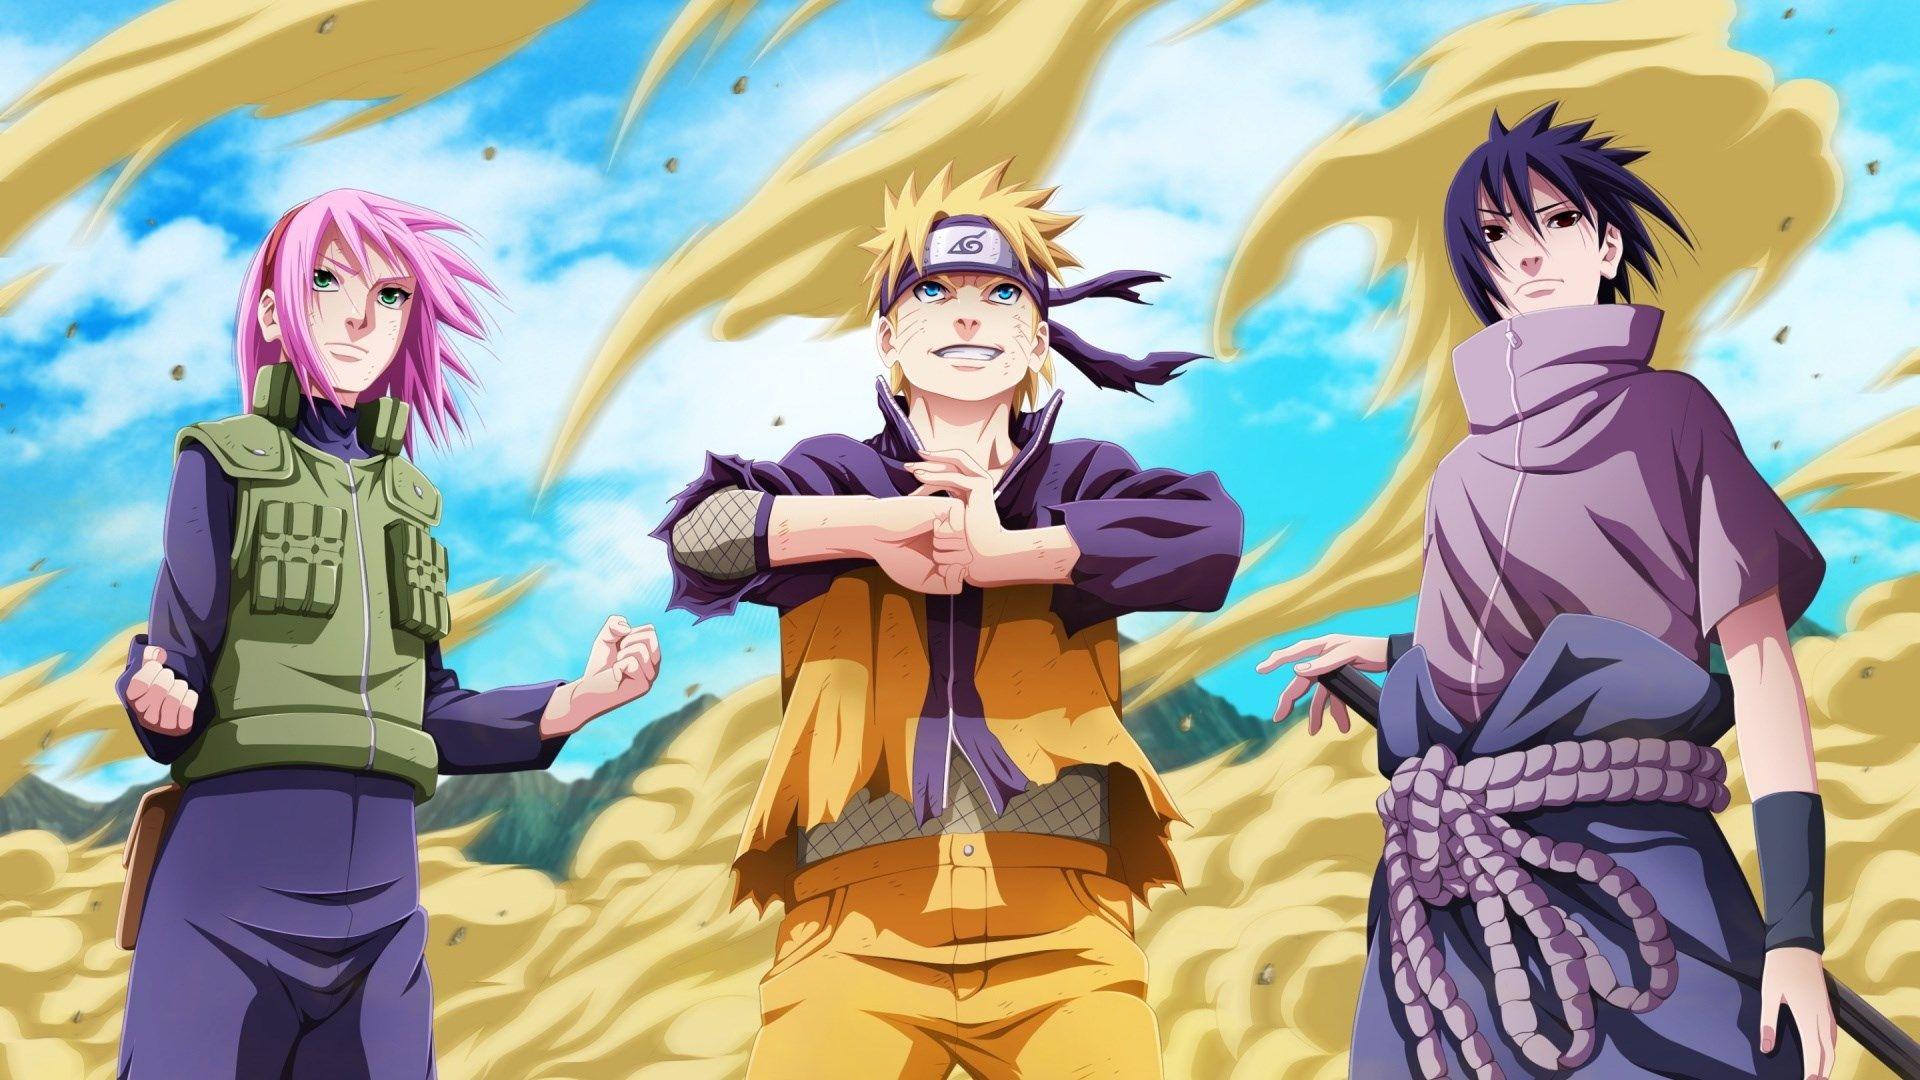 Hd Naruto 1920x1080 Backgrounds Ololoshenka Pinterest Naruto